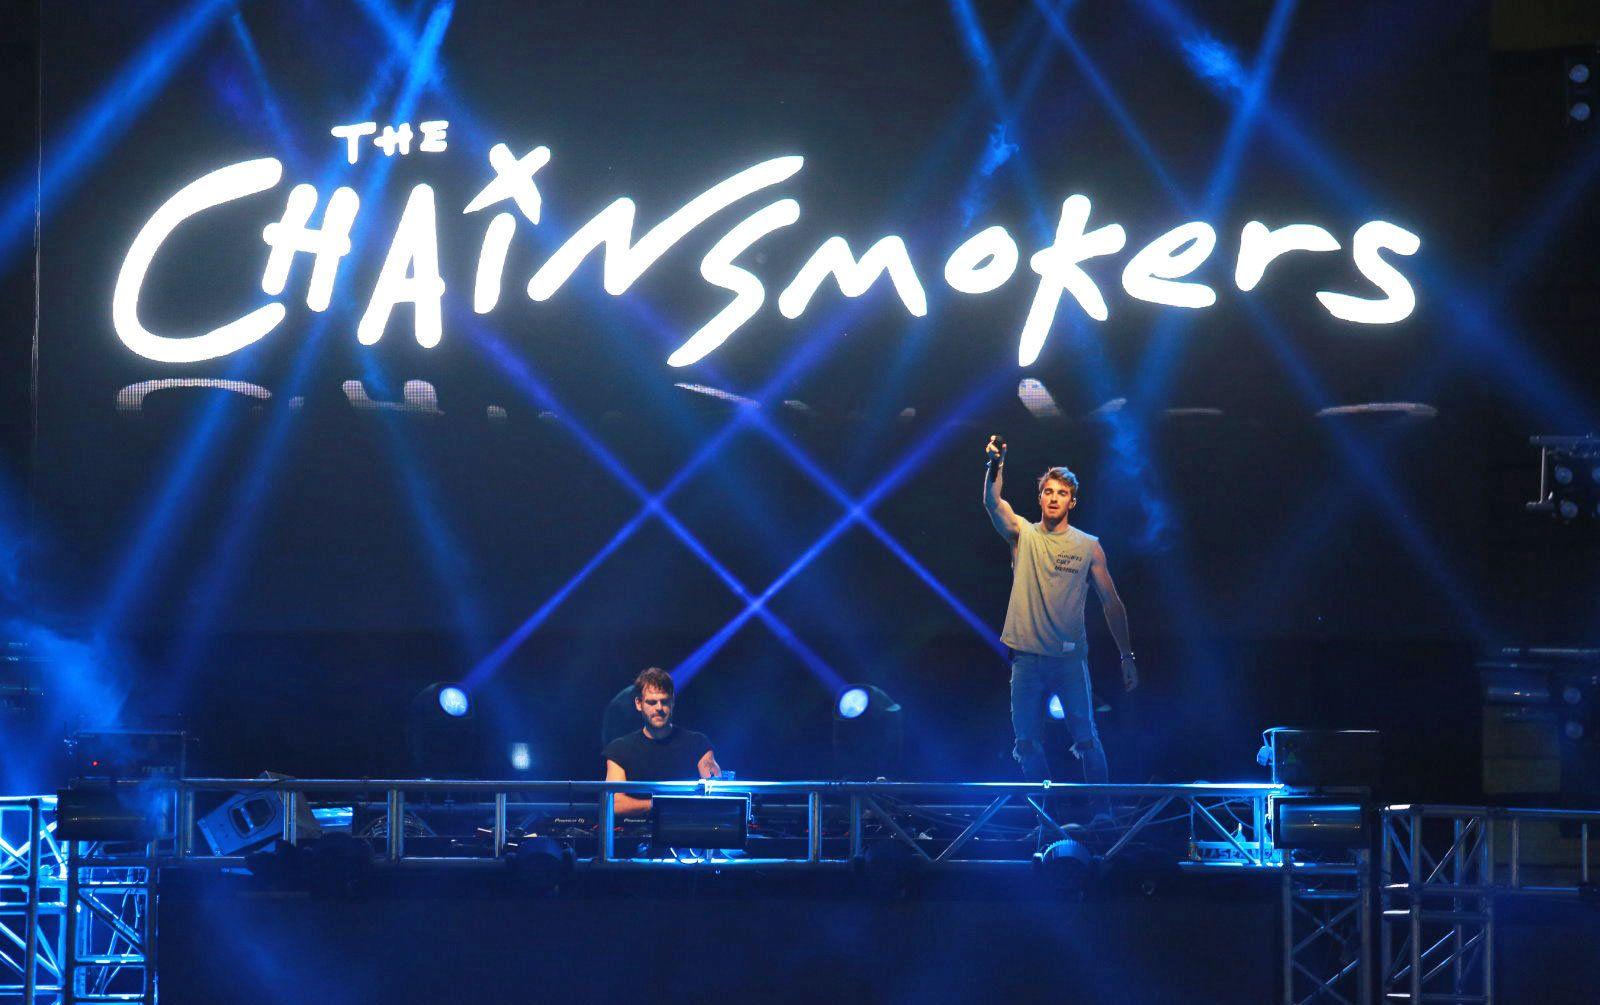 The Chainsmokers Concert Live Stream Https Livestreamdaily Com M